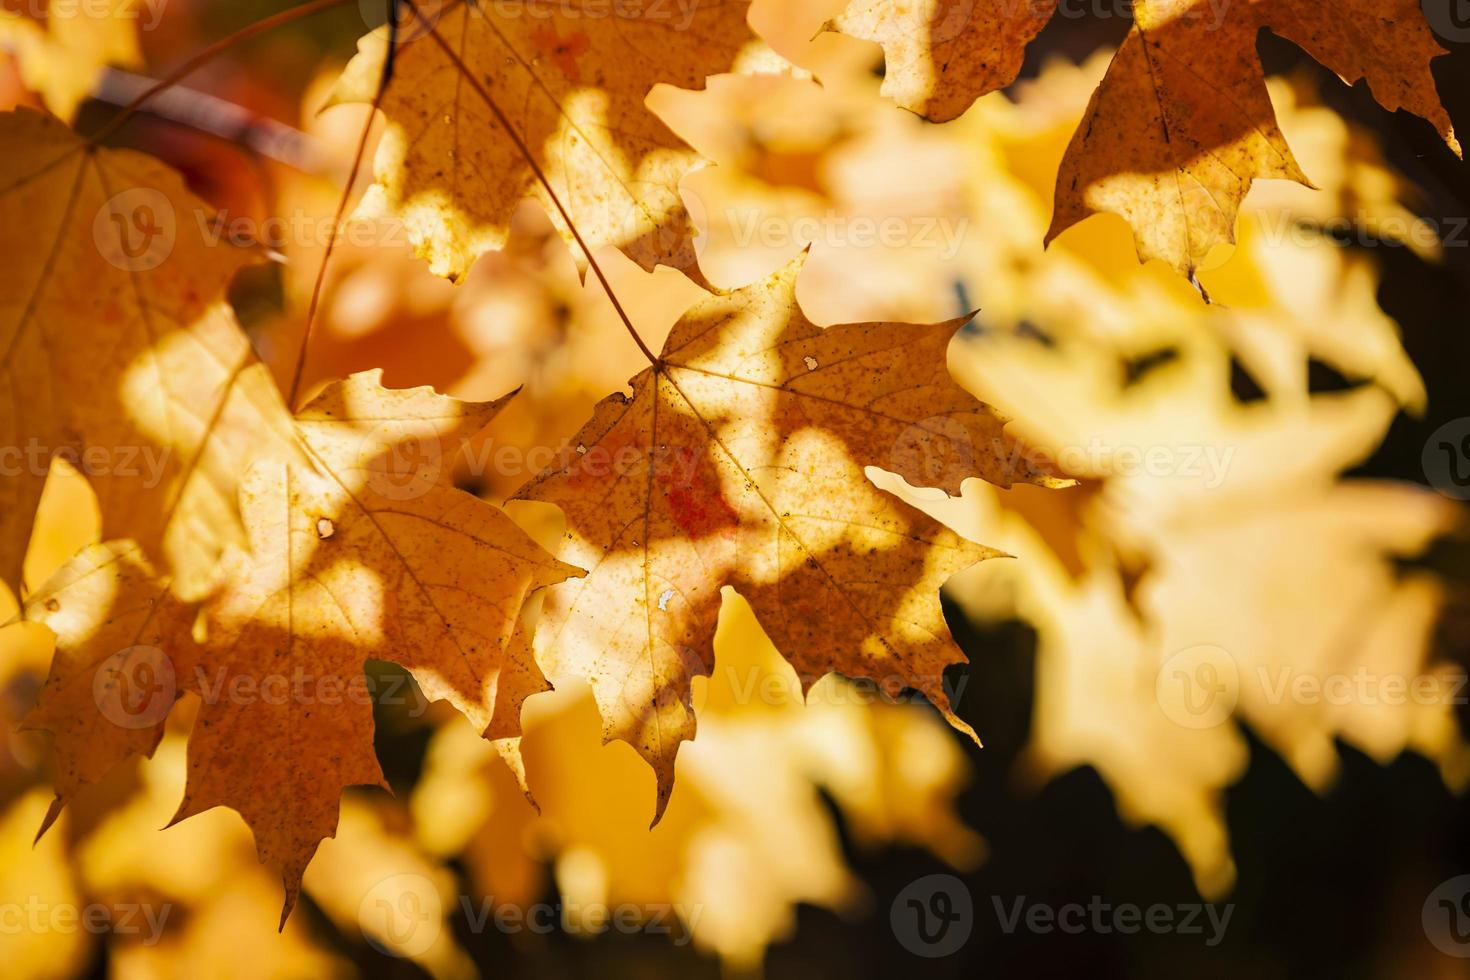 foglie d'acero autunnali retroilluminate foto